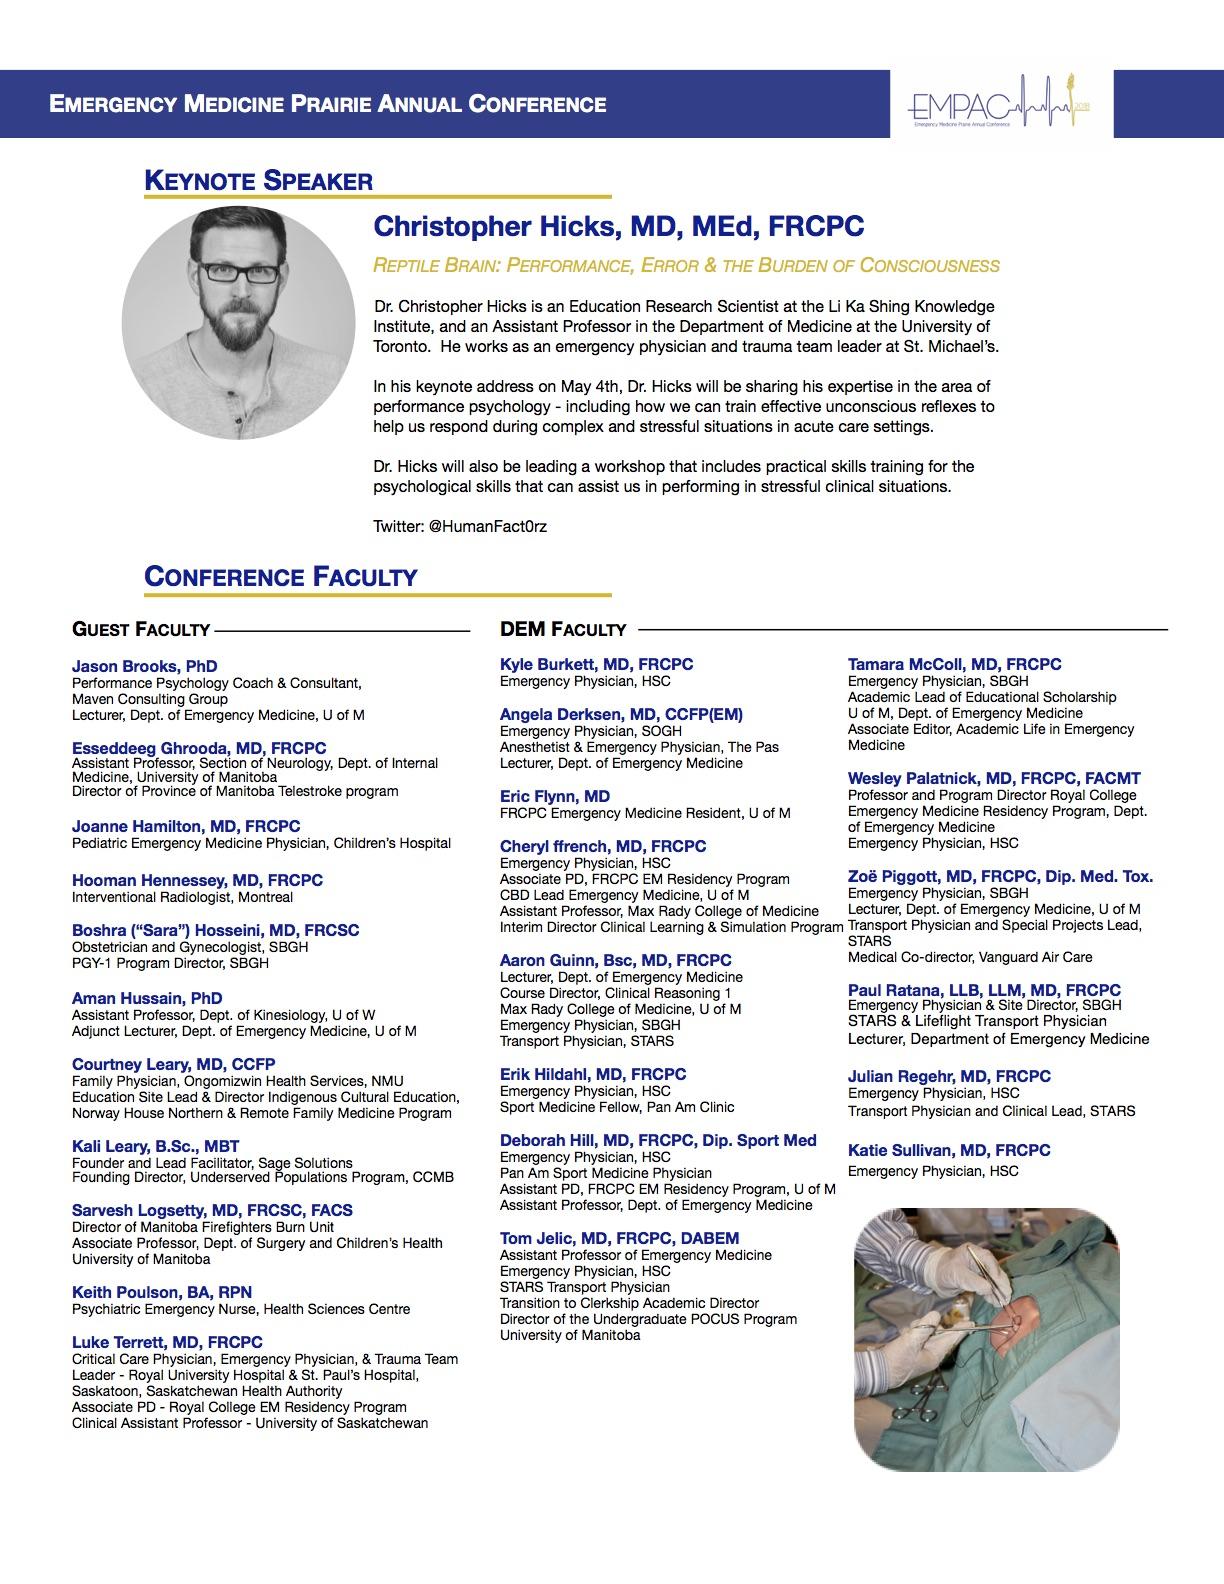 EMPAC2018 Brochure page 3